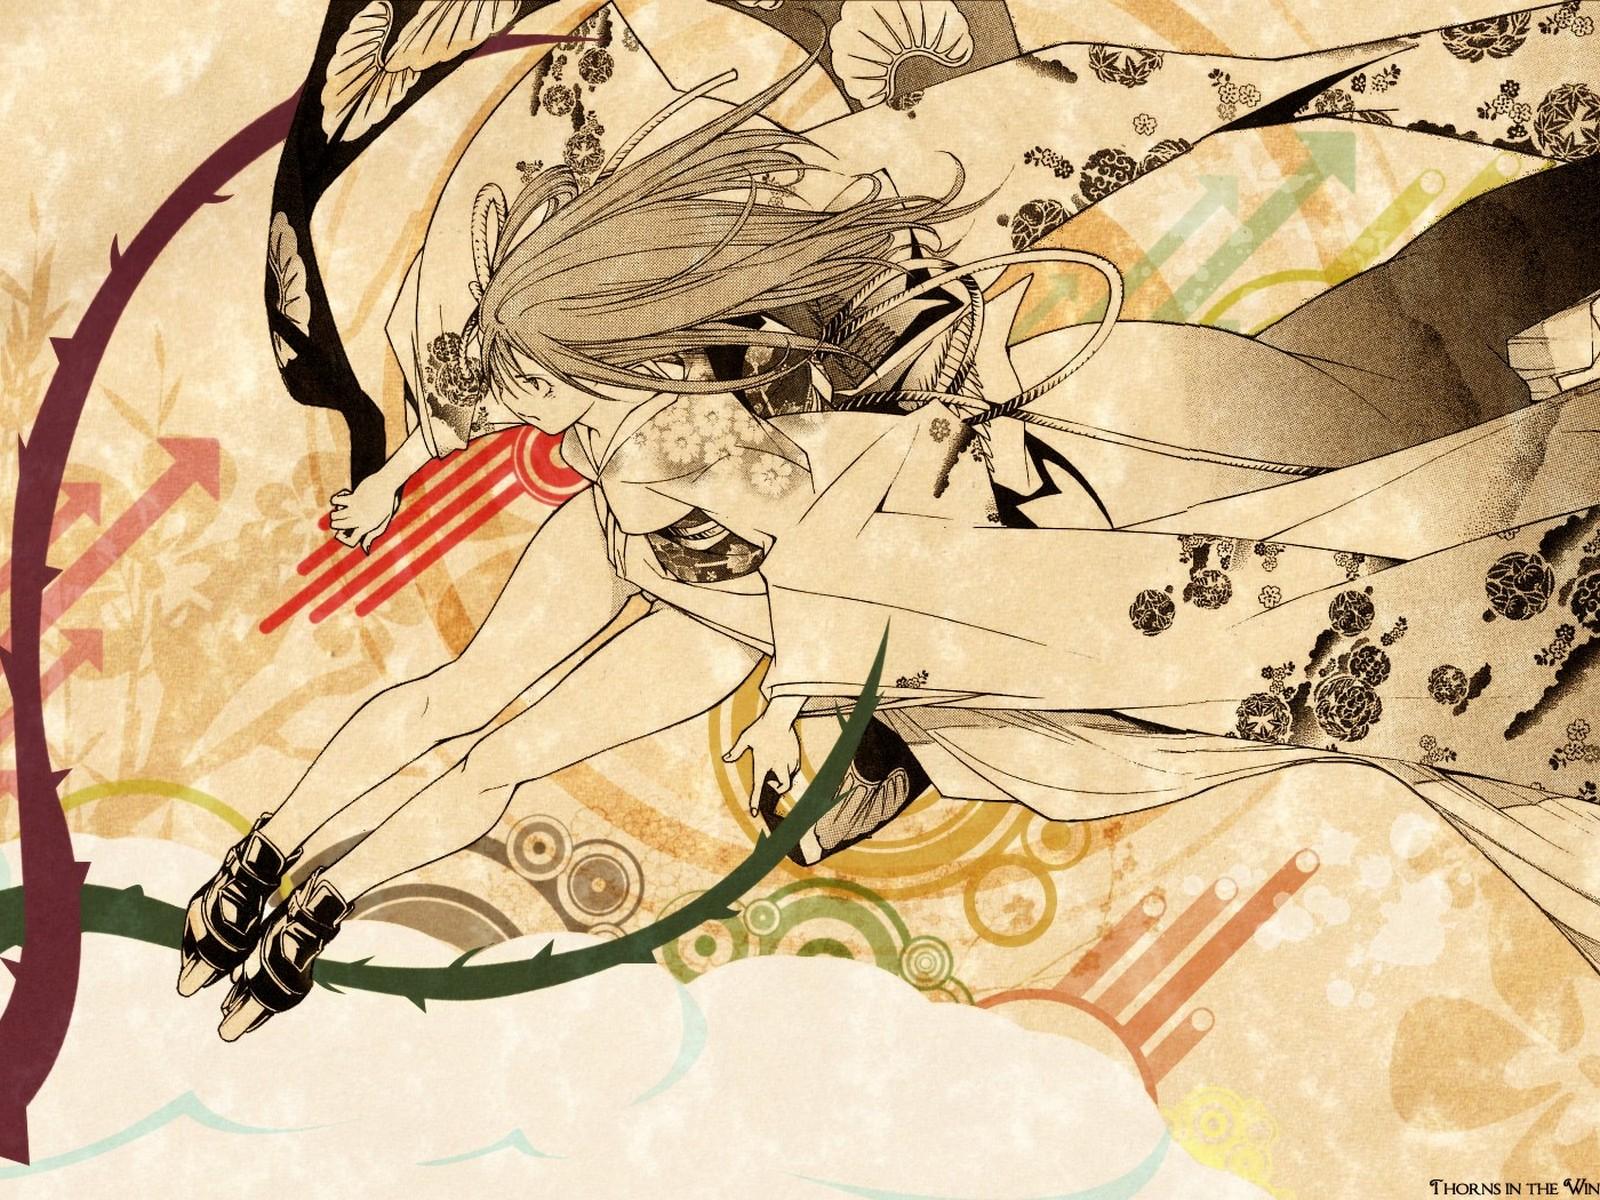 air_gear japanese_clothes kimono noyamano_ringo oh_great